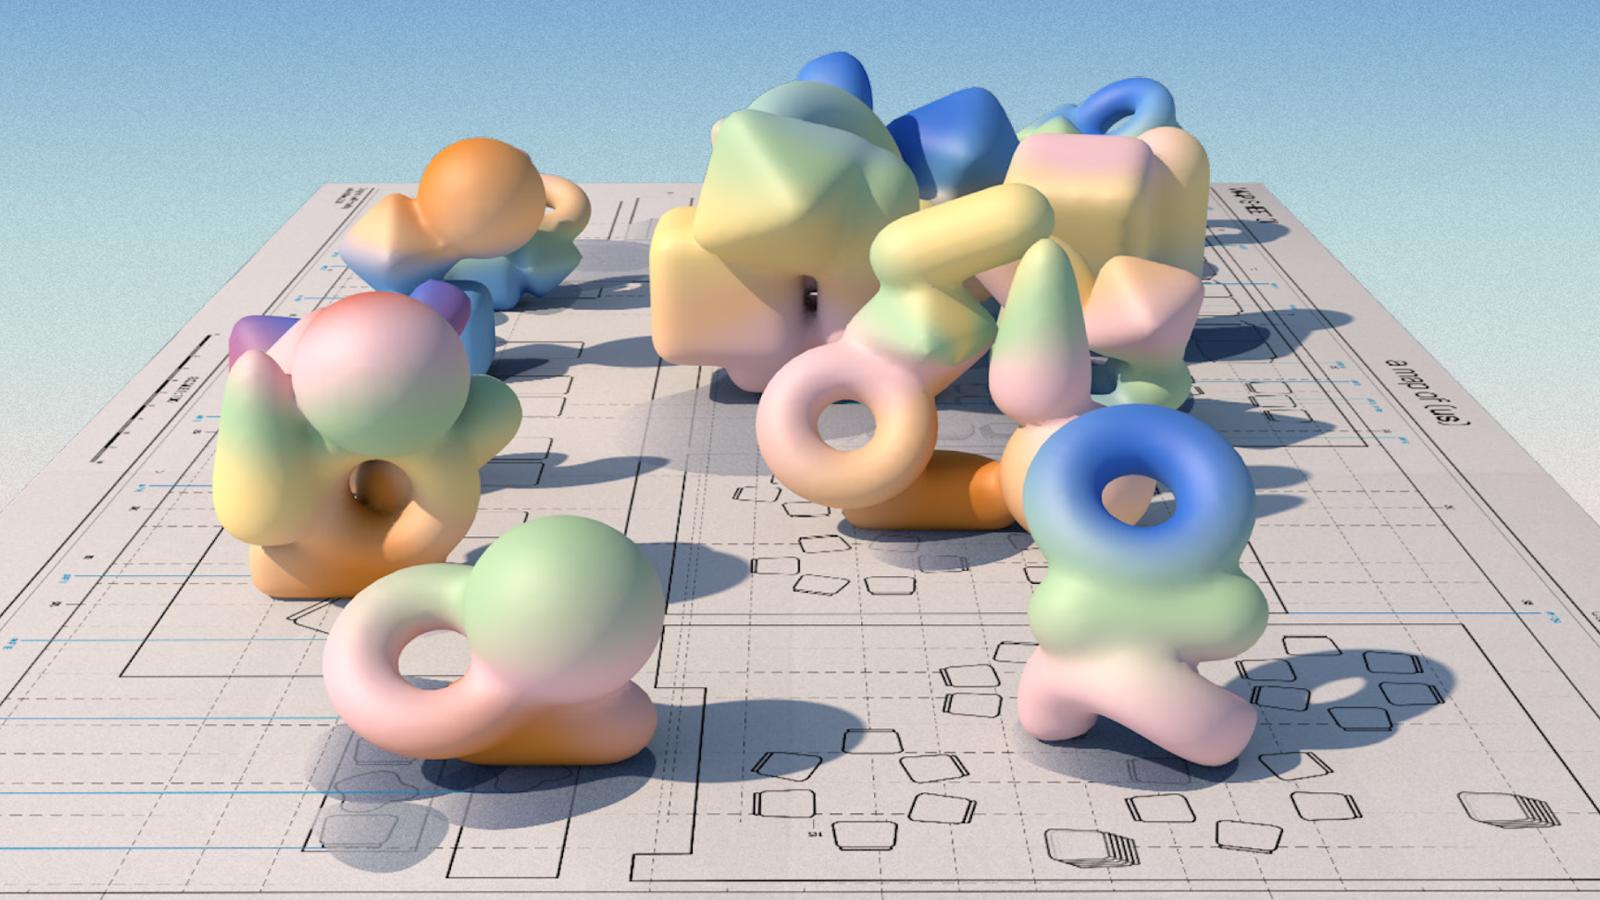 Pastel coloured 3D geometric shapes